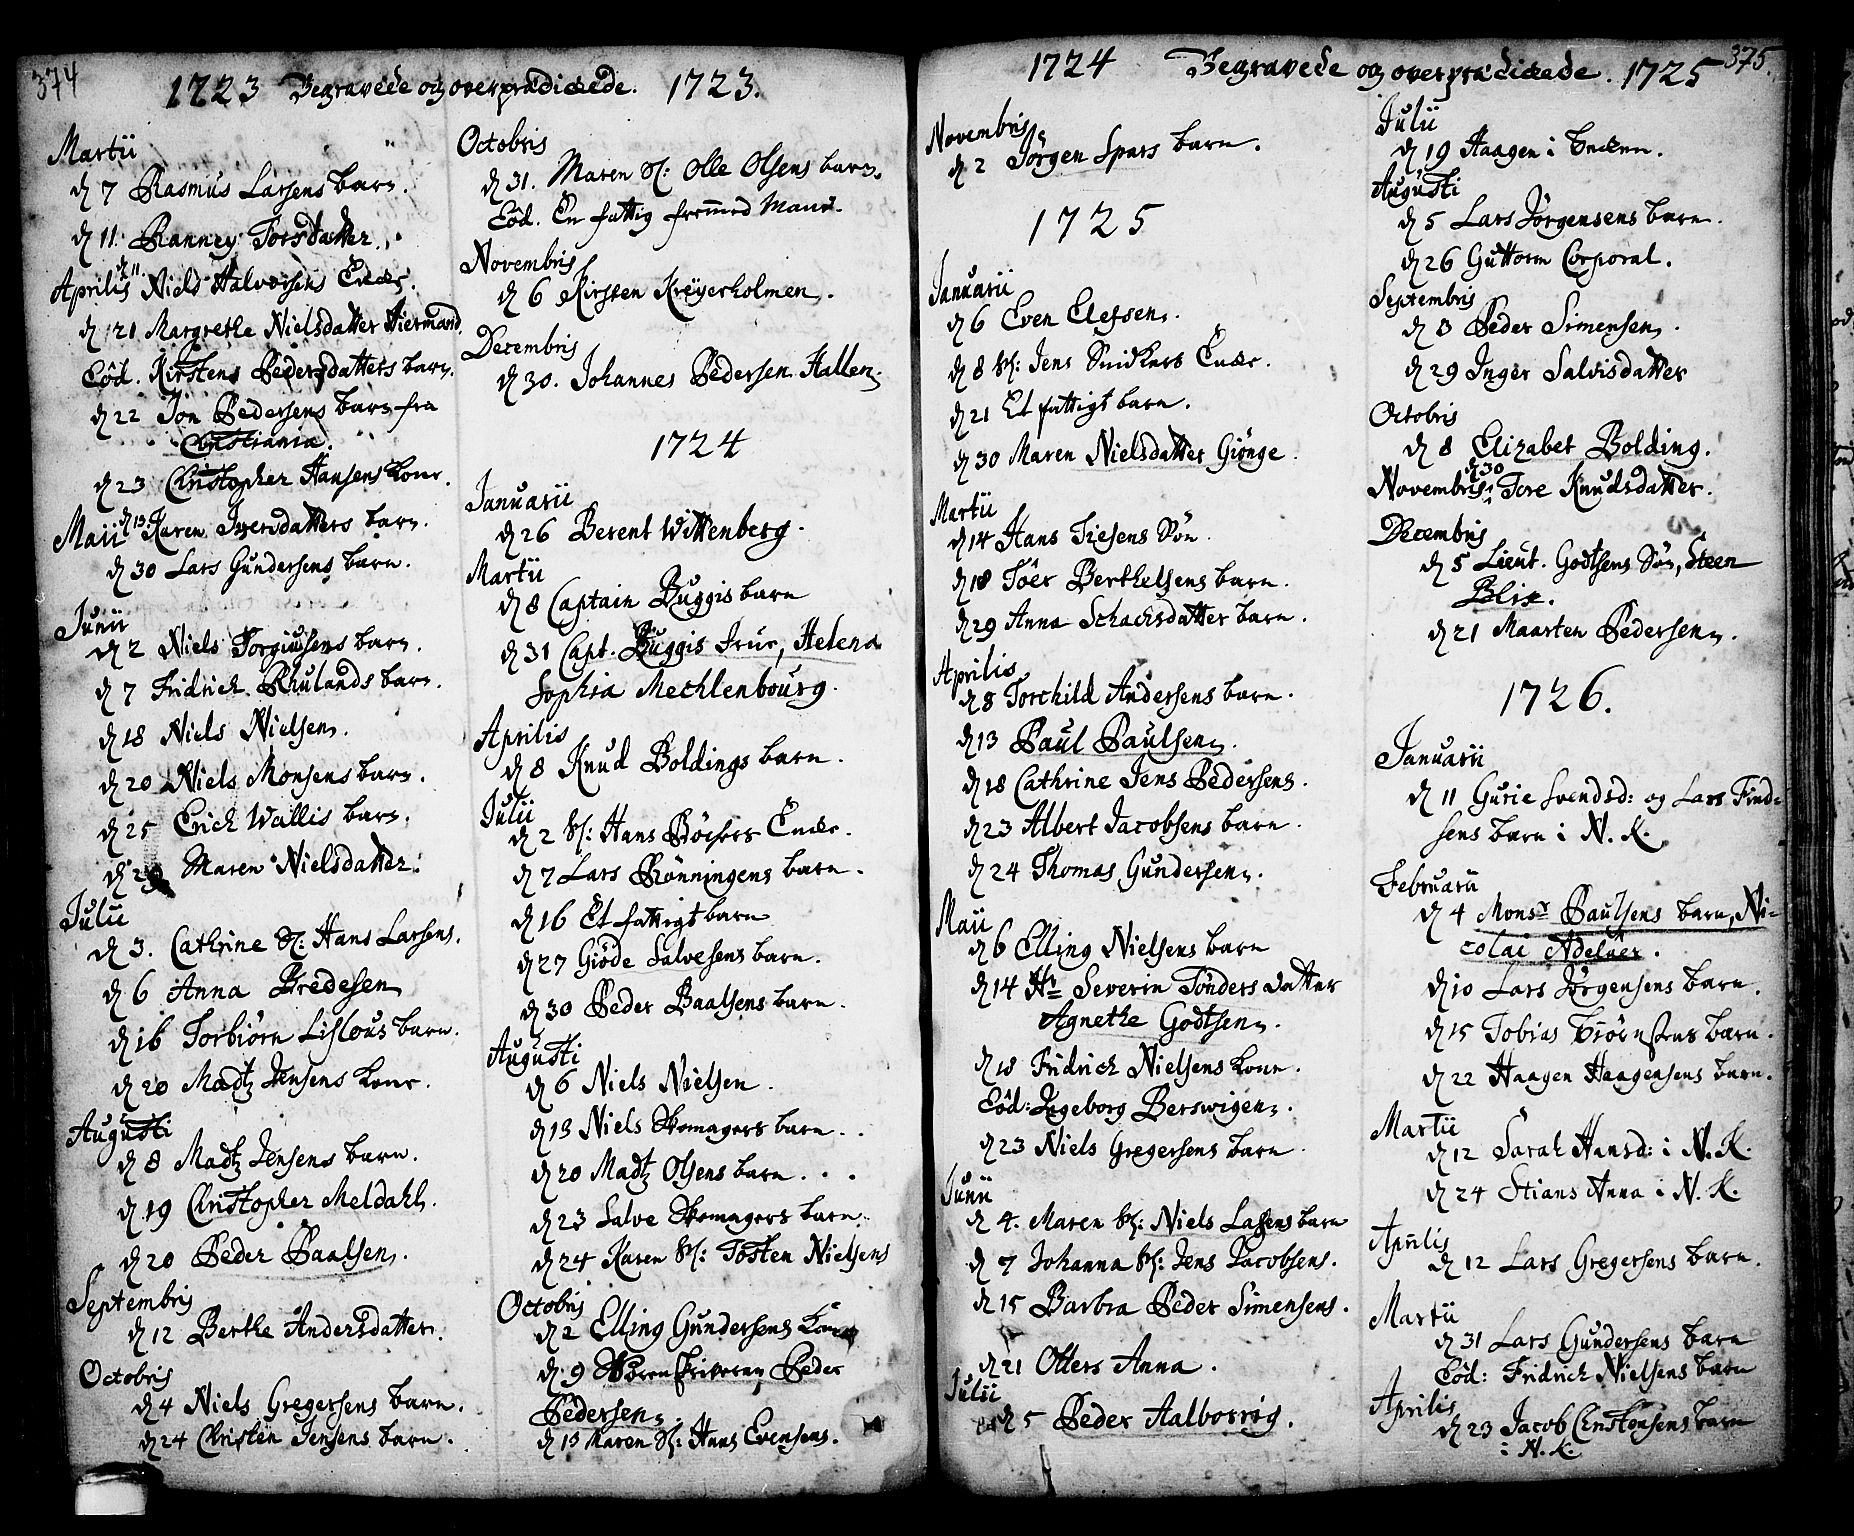 SAKO, Kragerø kirkebøker, F/Fa/L0001: Ministerialbok nr. 1, 1702-1766, s. 374-375